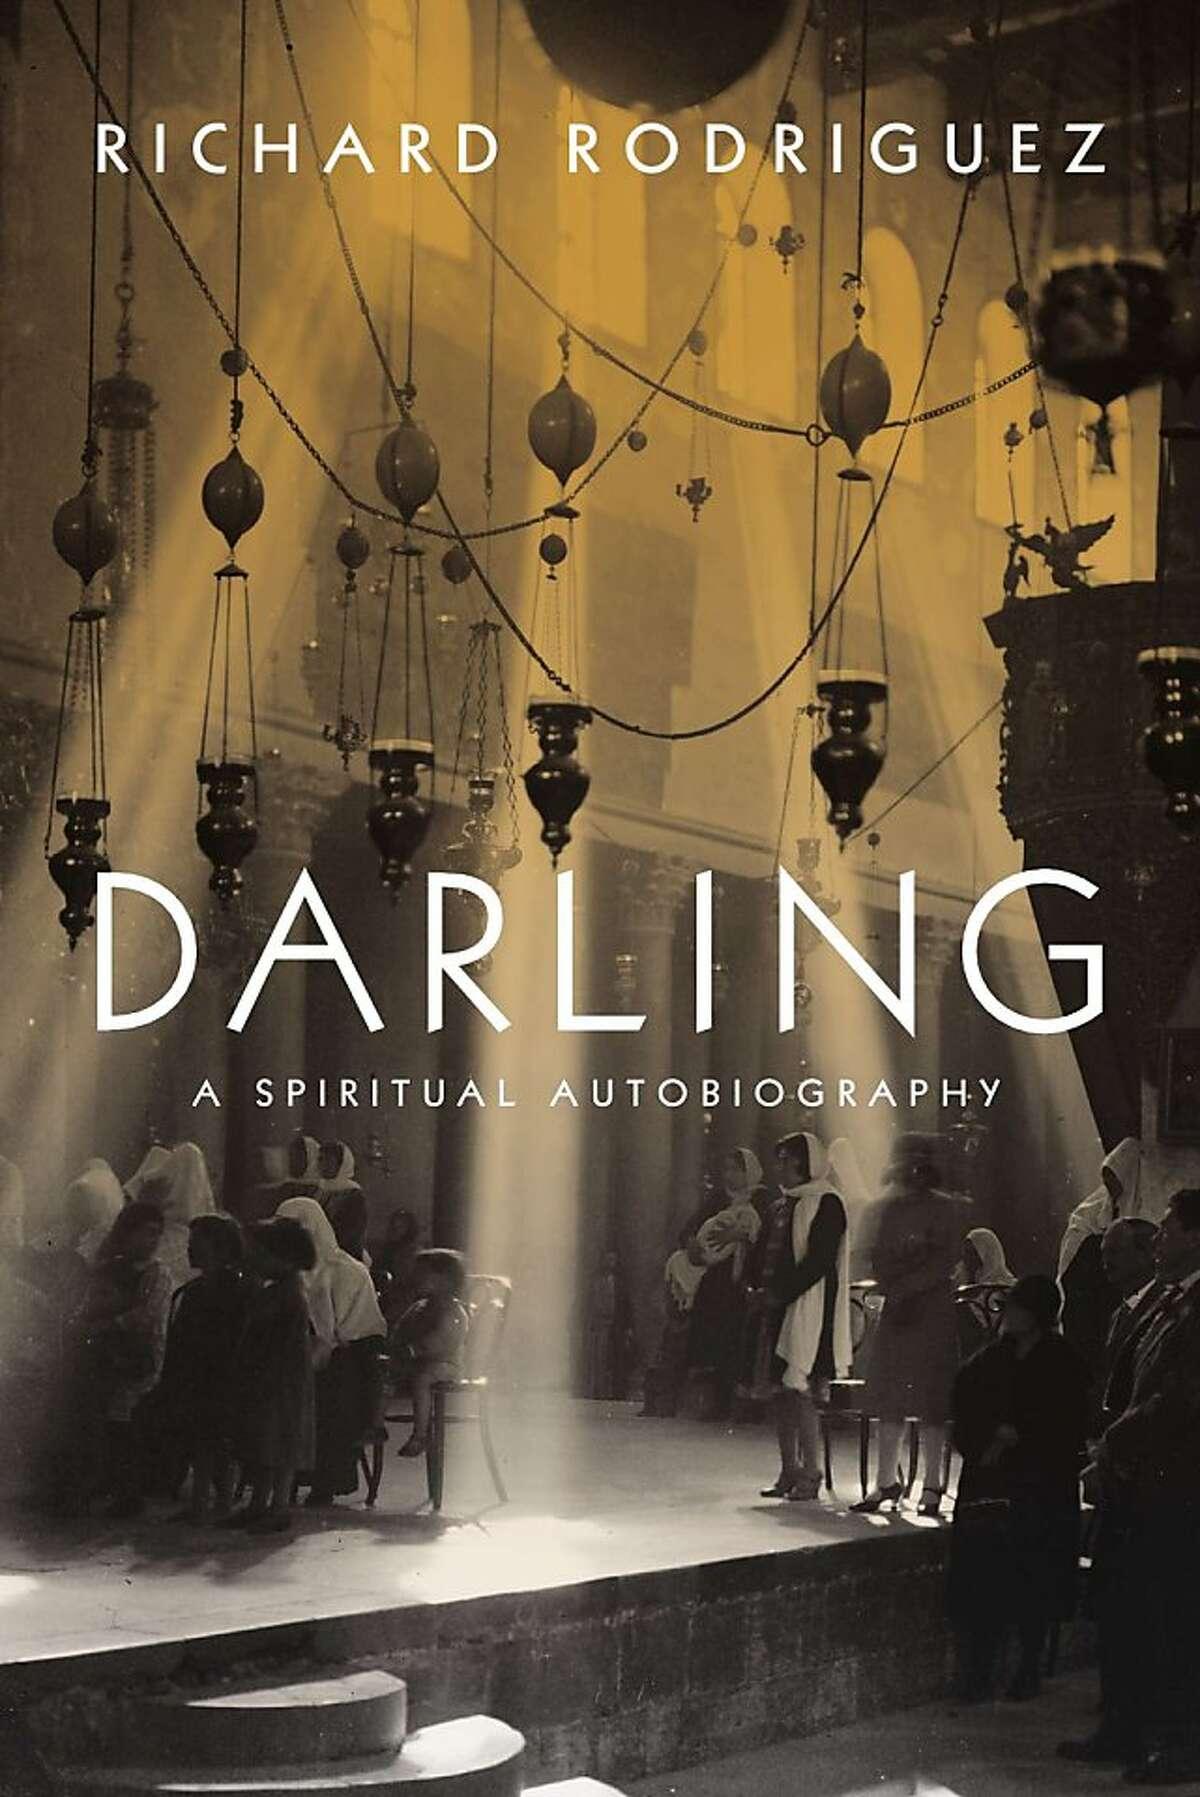 Darling, by Richard Rodriguez